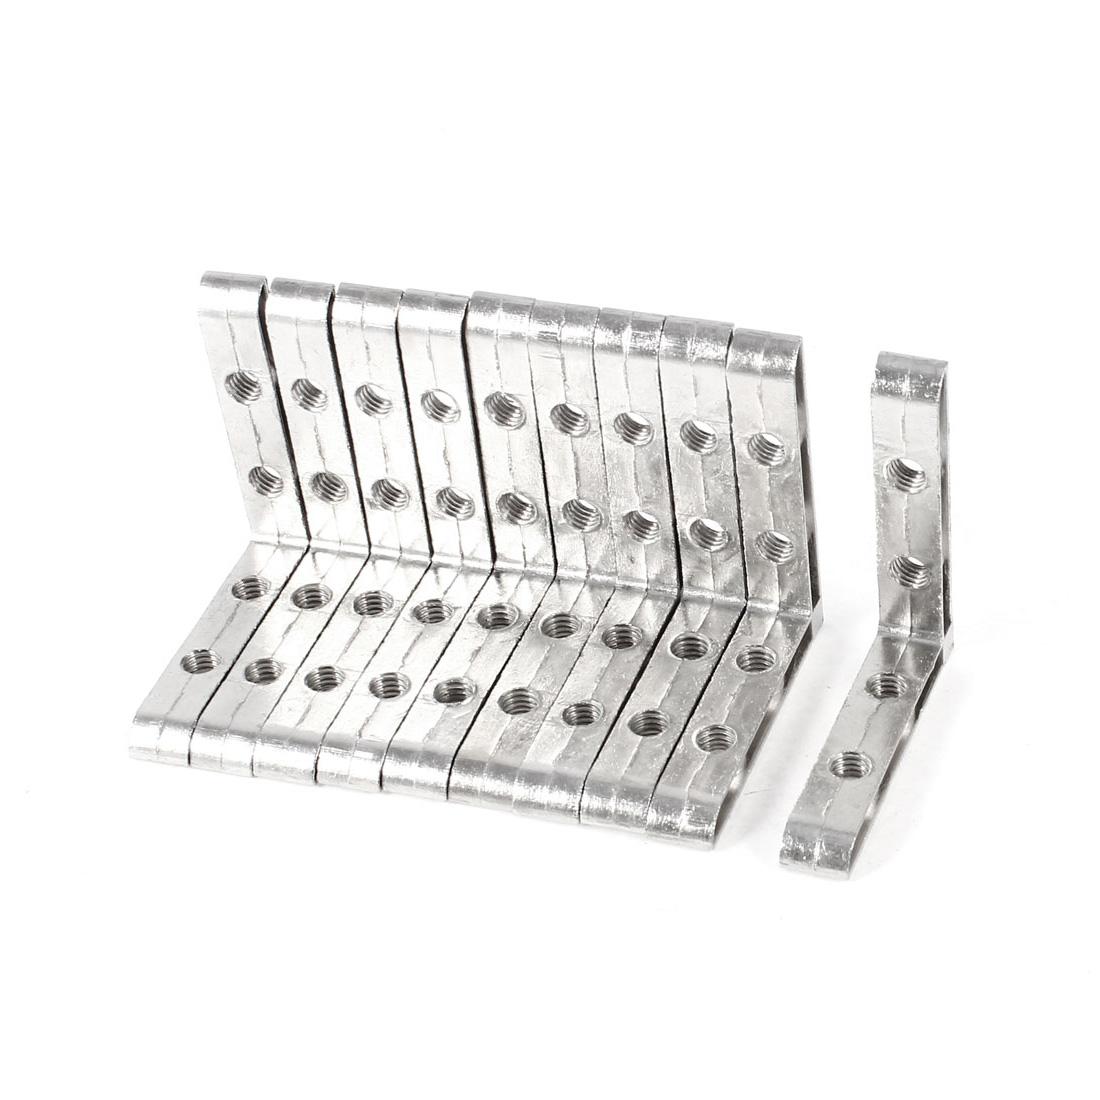 10 Pcs Angle Plate Corner Brace Flat L Shape Repair Bracket 50mm x 50mm